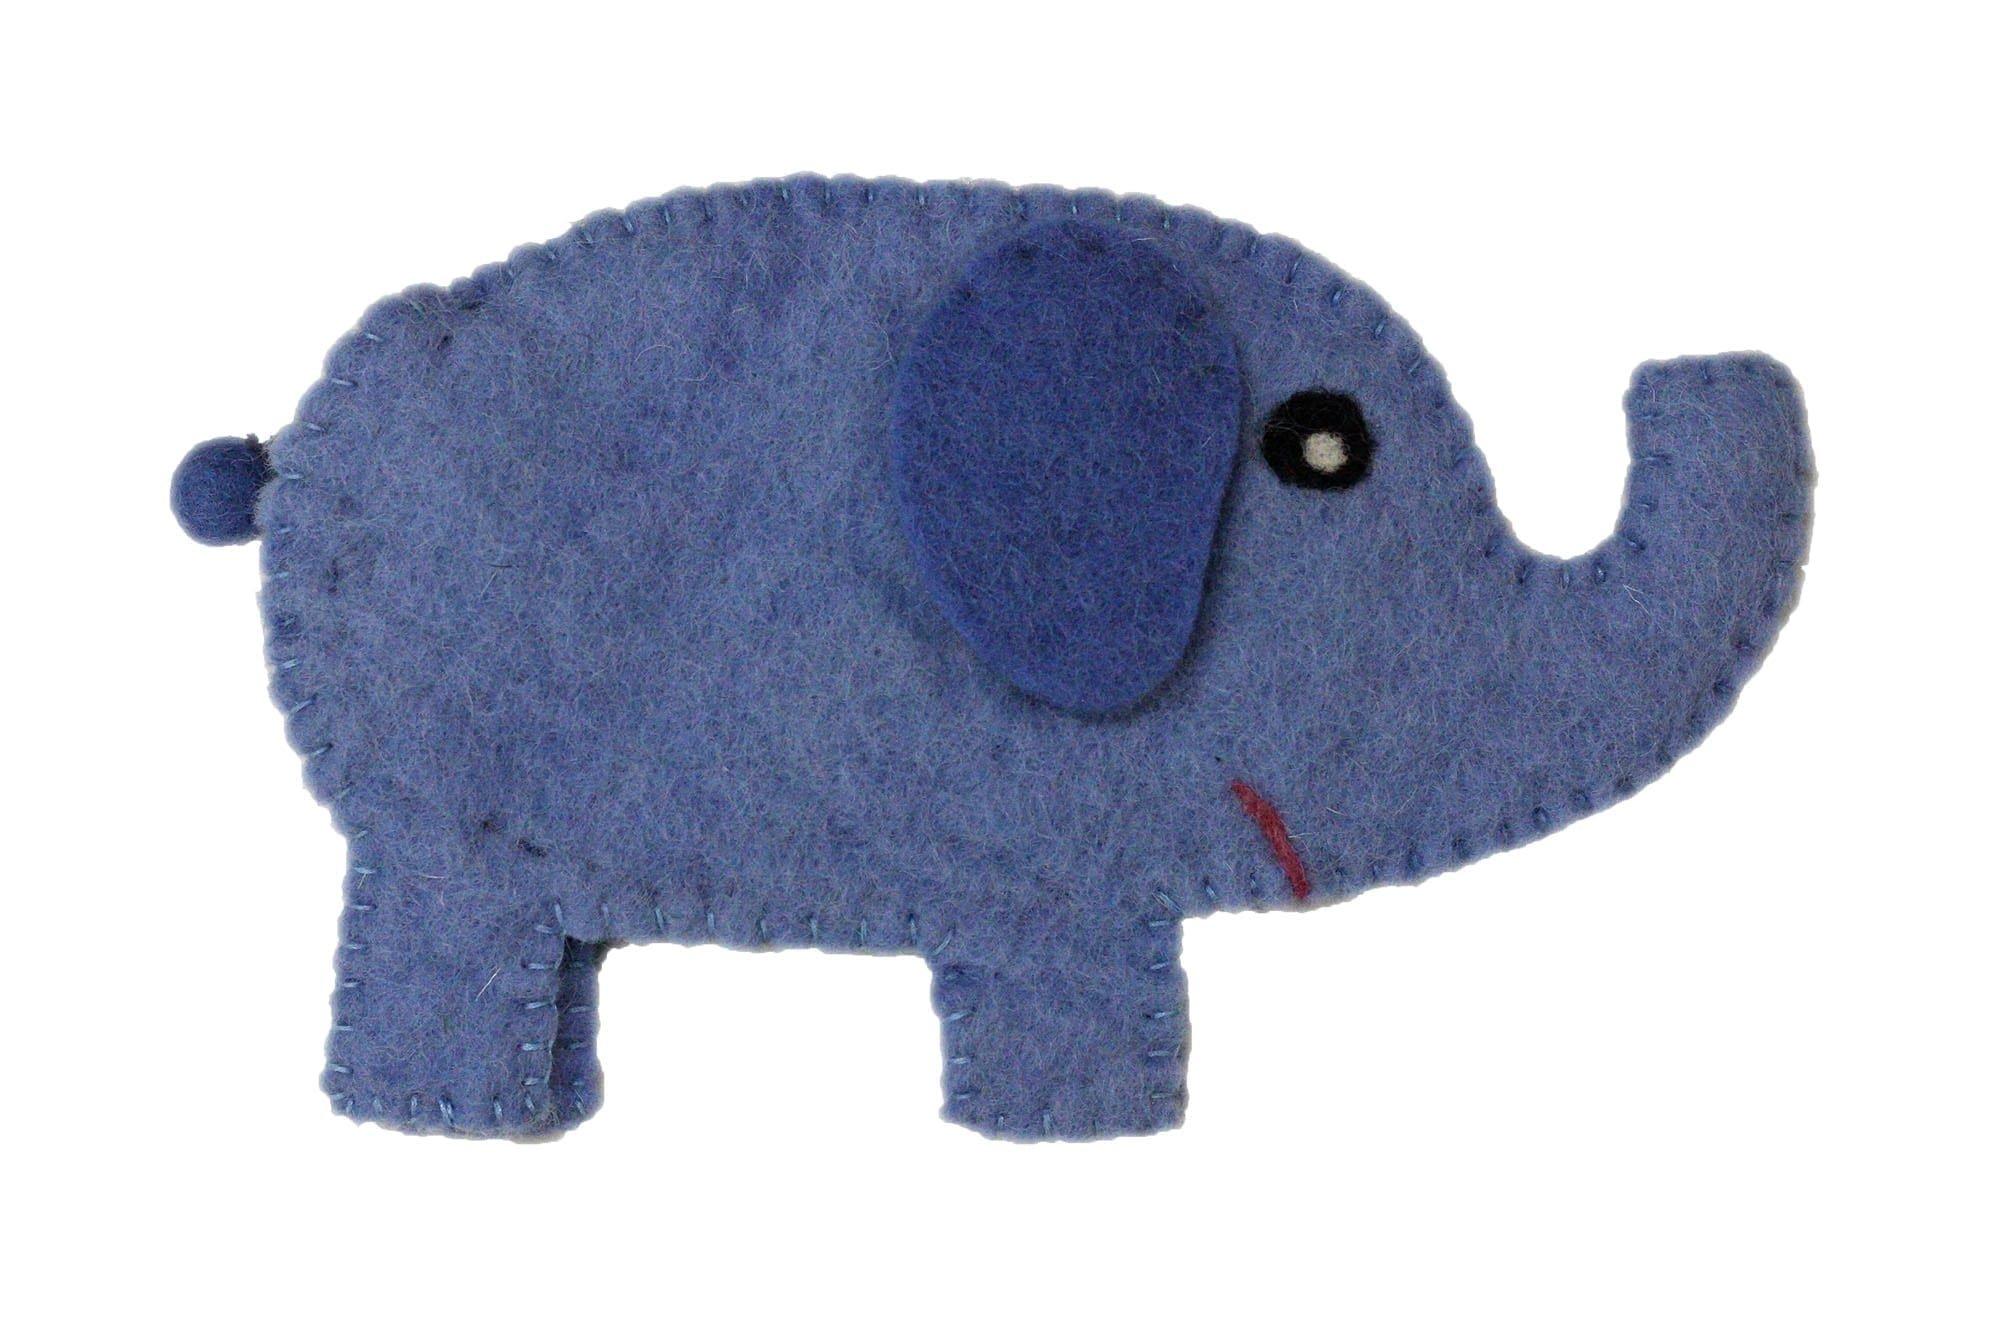 Felted Elephant notions bag